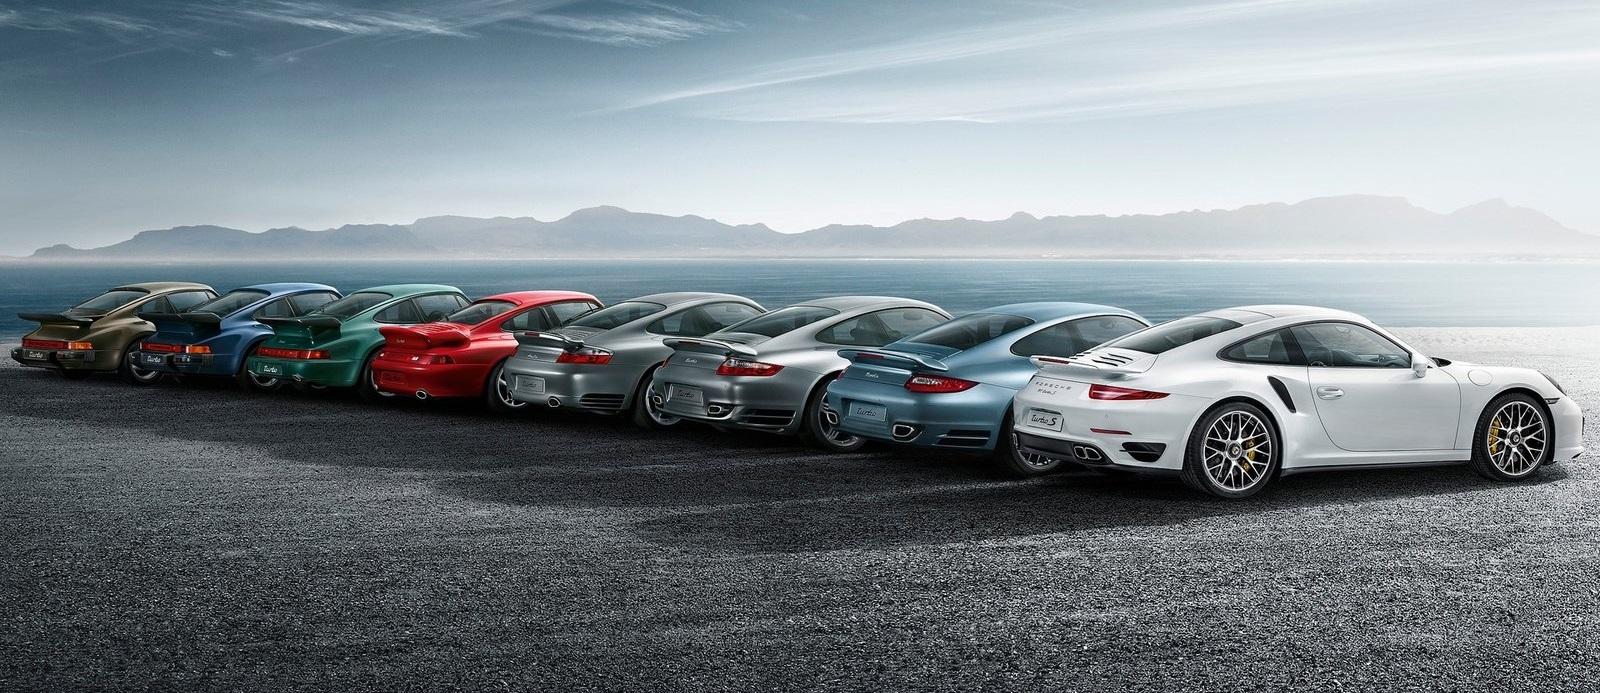 Porsche 911 turbo s 2014 7